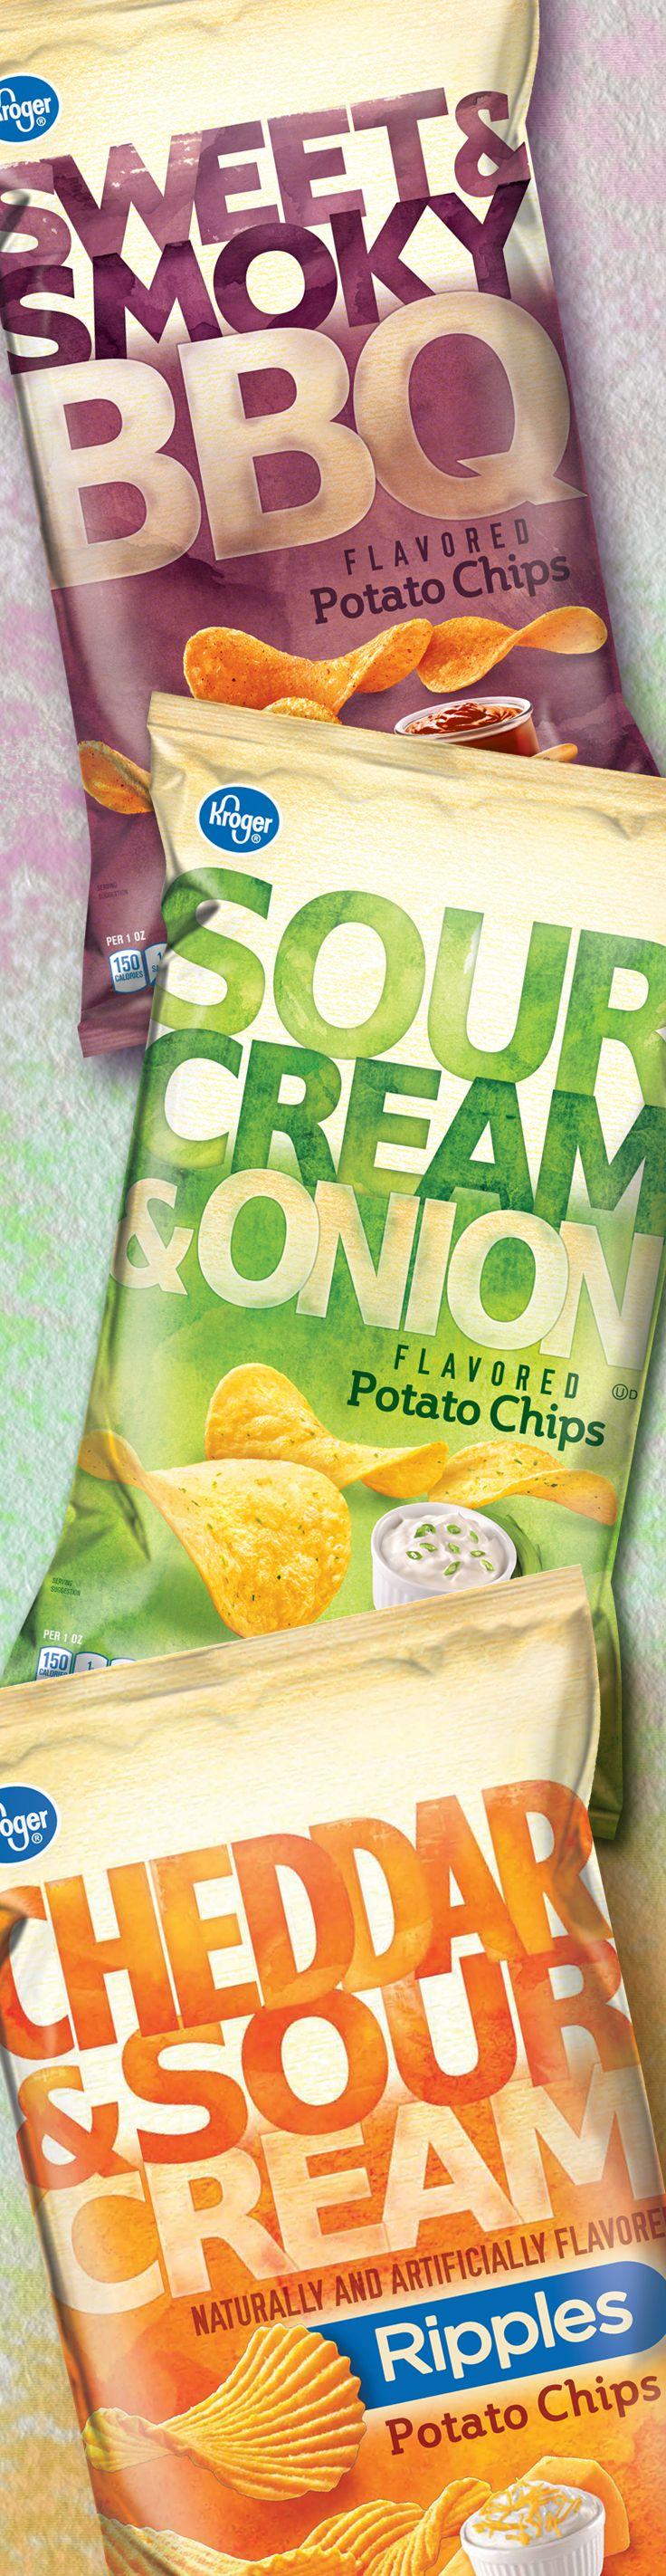 Kroger, Potato Chips - Packaging designed by Design Resource Center http://www.drcchicago.com/